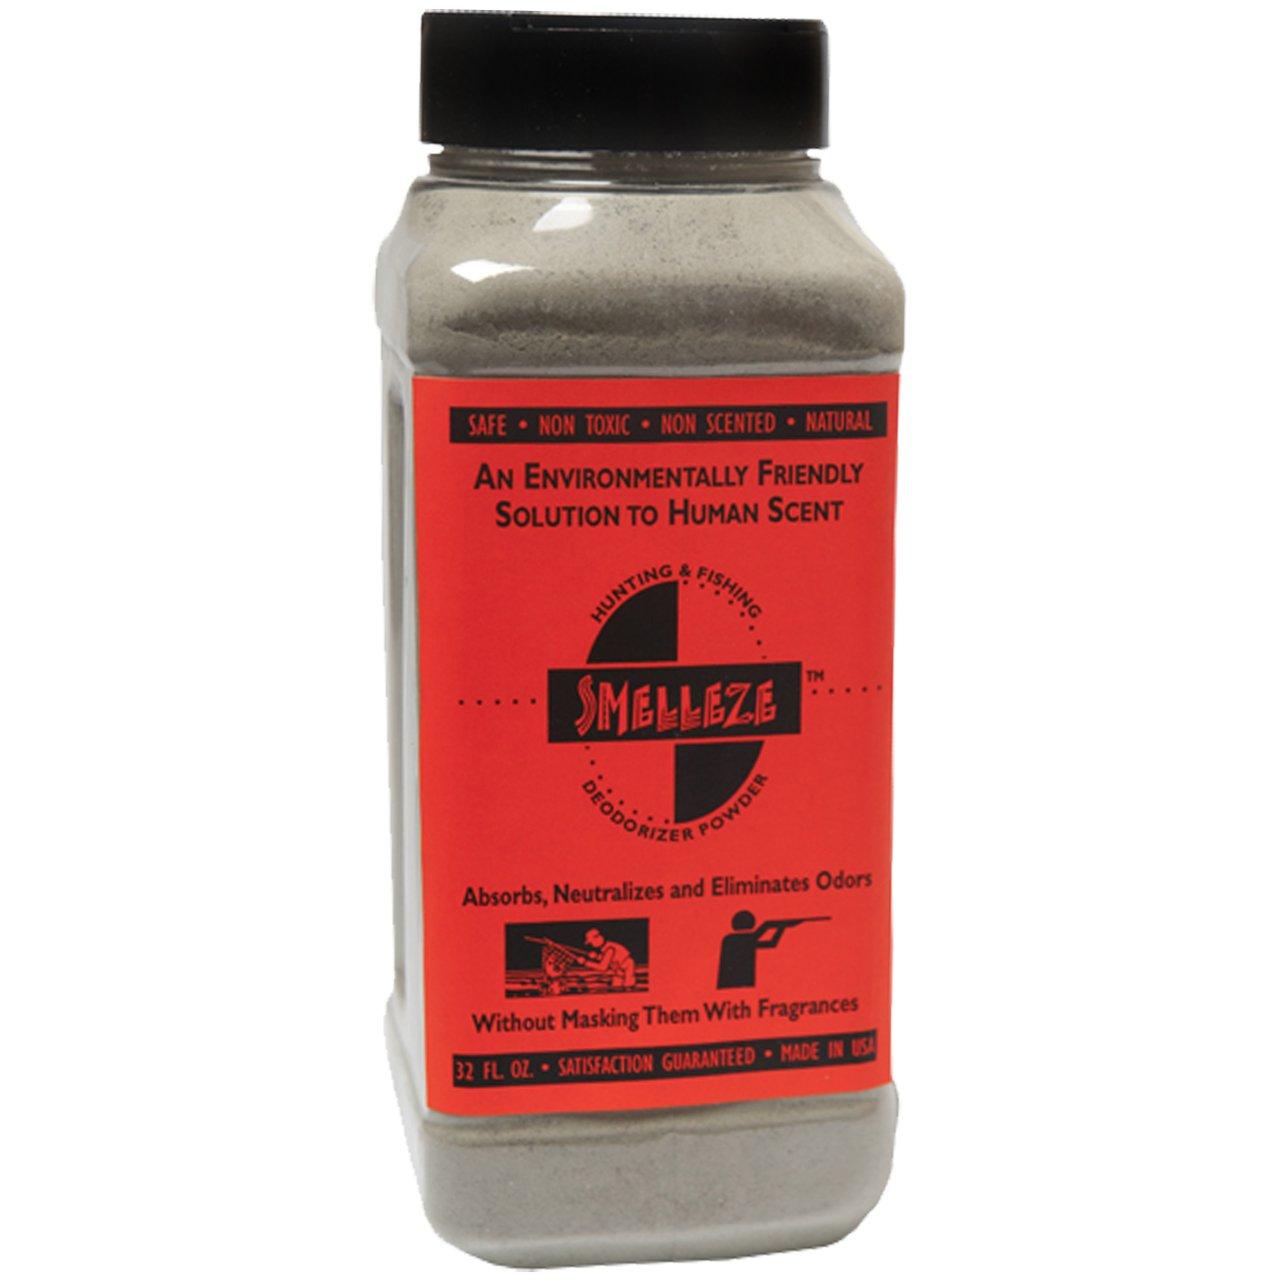 SMELLEZE Natural Humana aroma Remover Deodorizer: 2 Lb. polvo se Caza Scent Out IMTEK Environmental Corp.